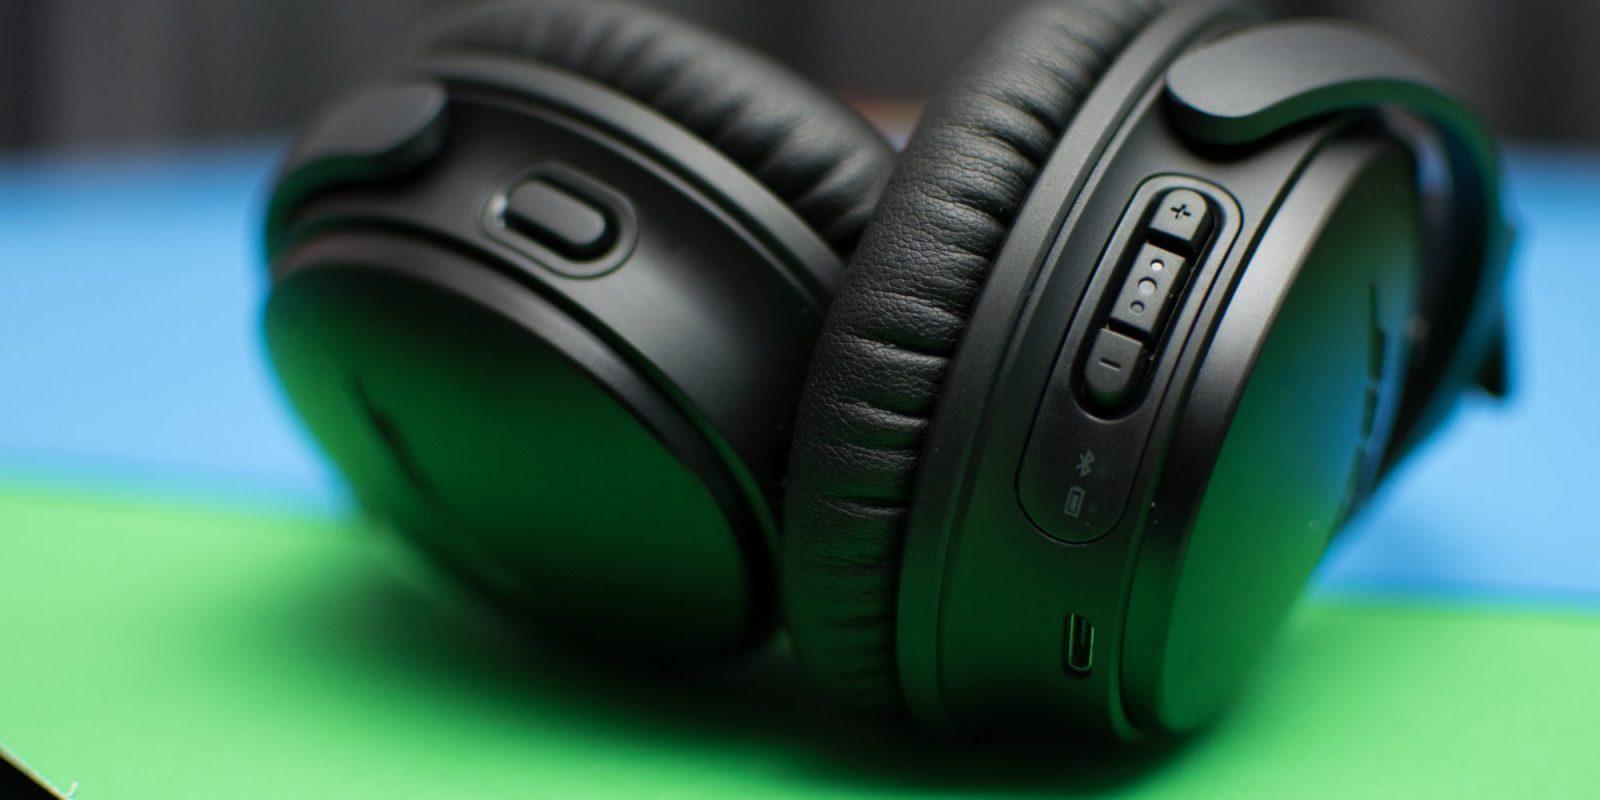 ecbe3f10a46 Bose launches Amazon Alexa integration for its QuietComfort 35 II headphones